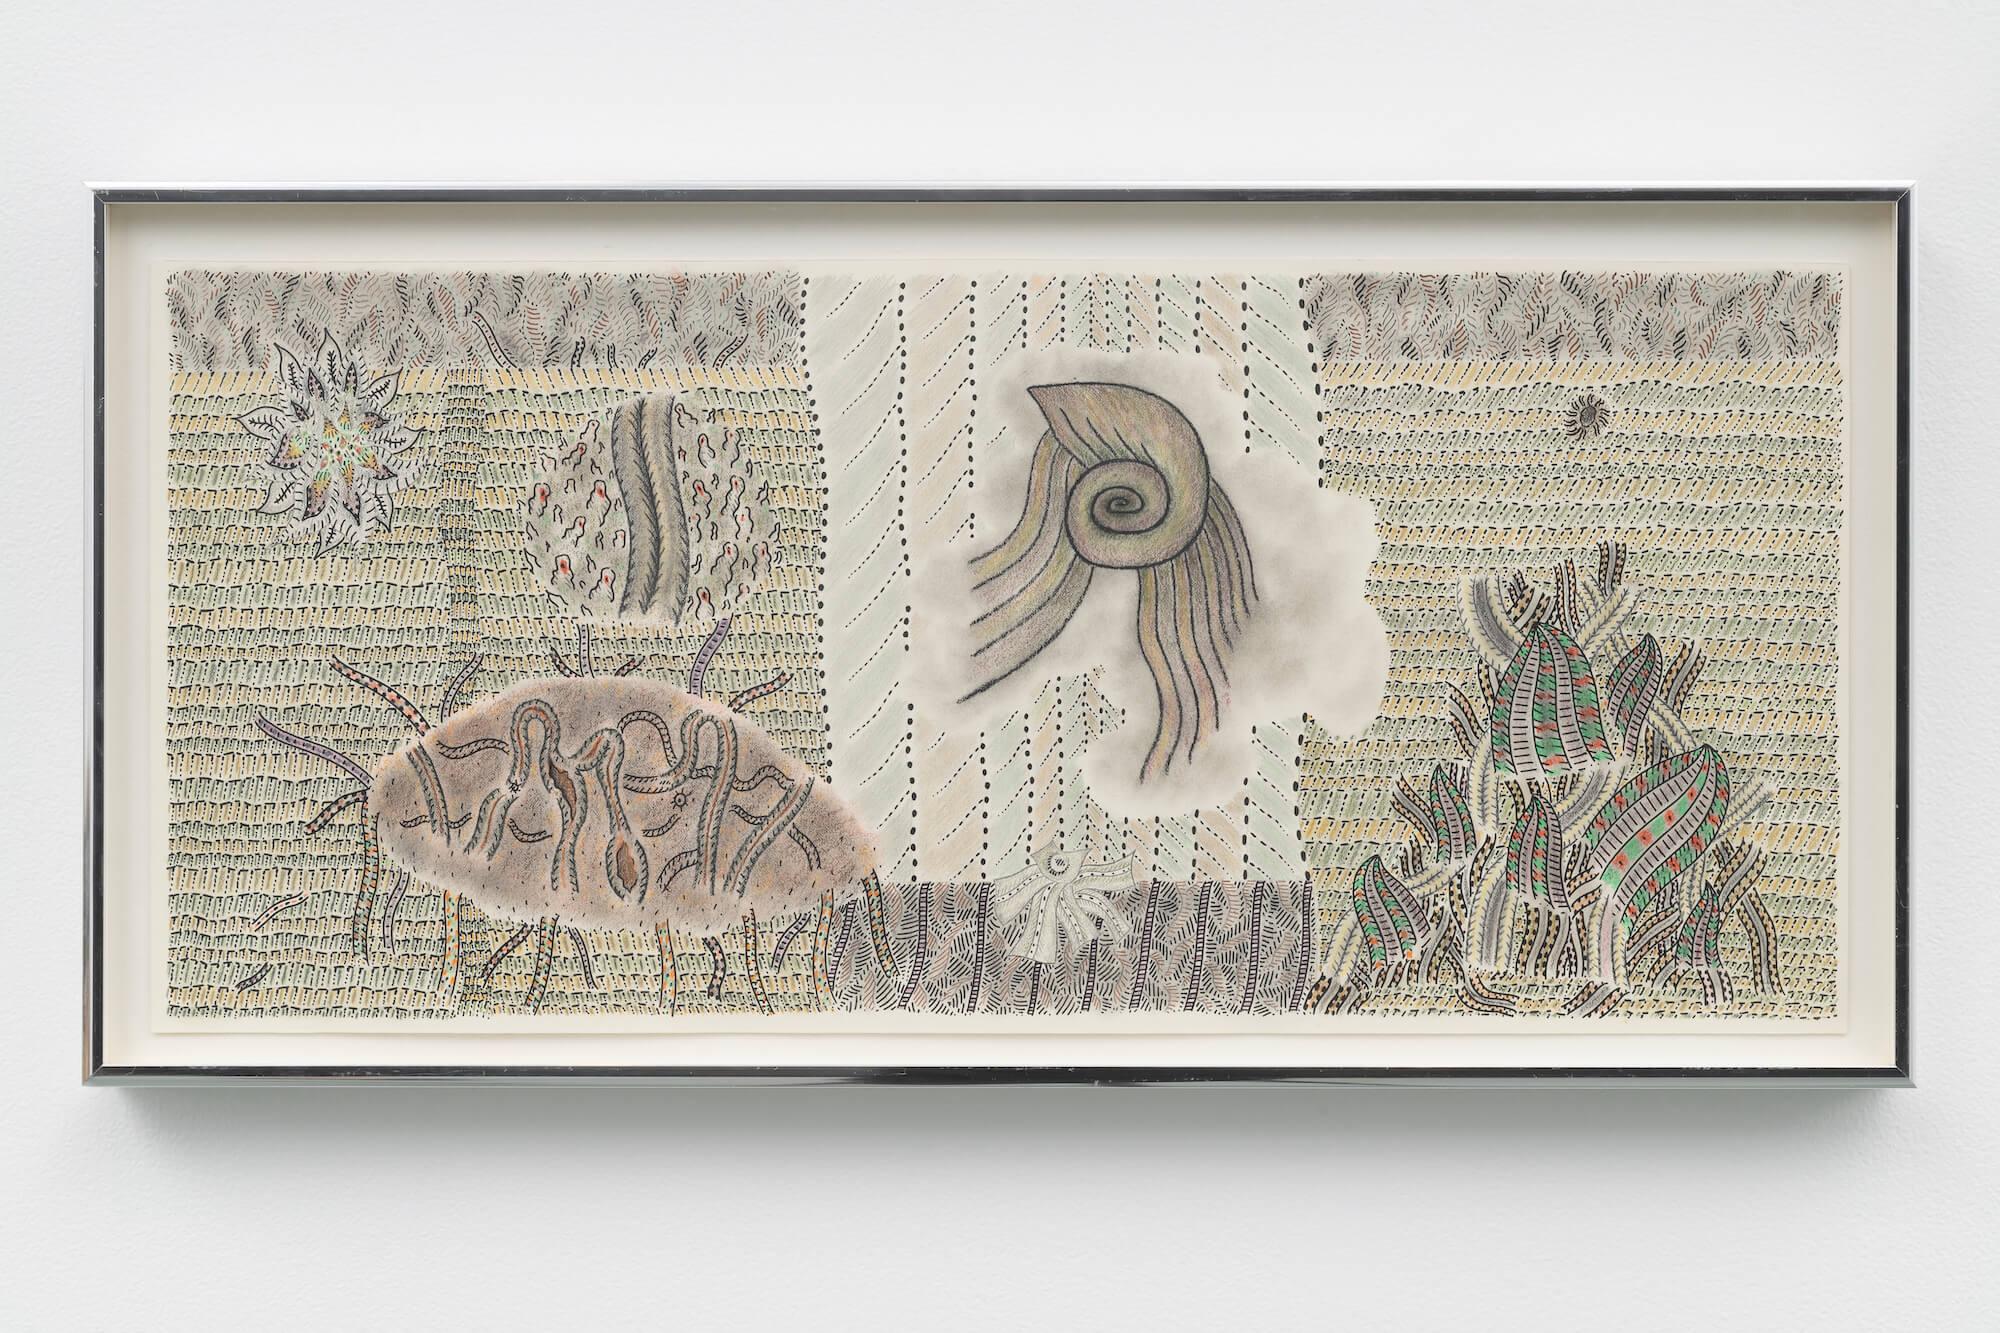 Statsinger, Untitled, 1982 (0320005) A